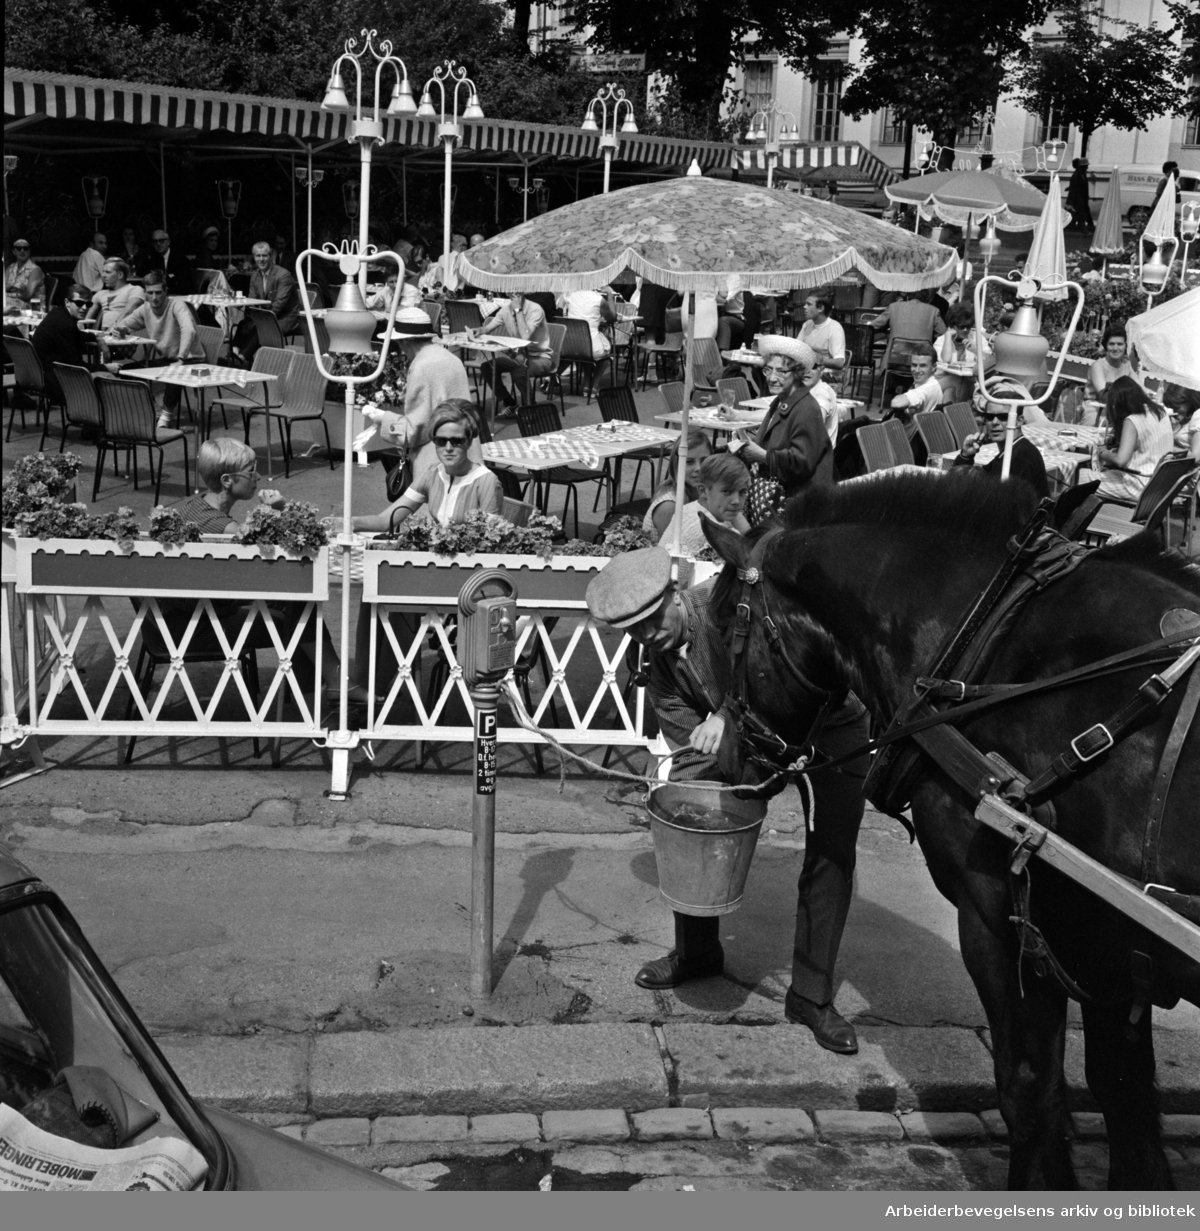 """På gampingtur i asfaltjungelen"". Arbeiderbladets journalist Bjørn ""Ausjen"" Johannessen og gampen ""Gubben"" utenfor friluftsrestauranten Pernille. Juli 1968"